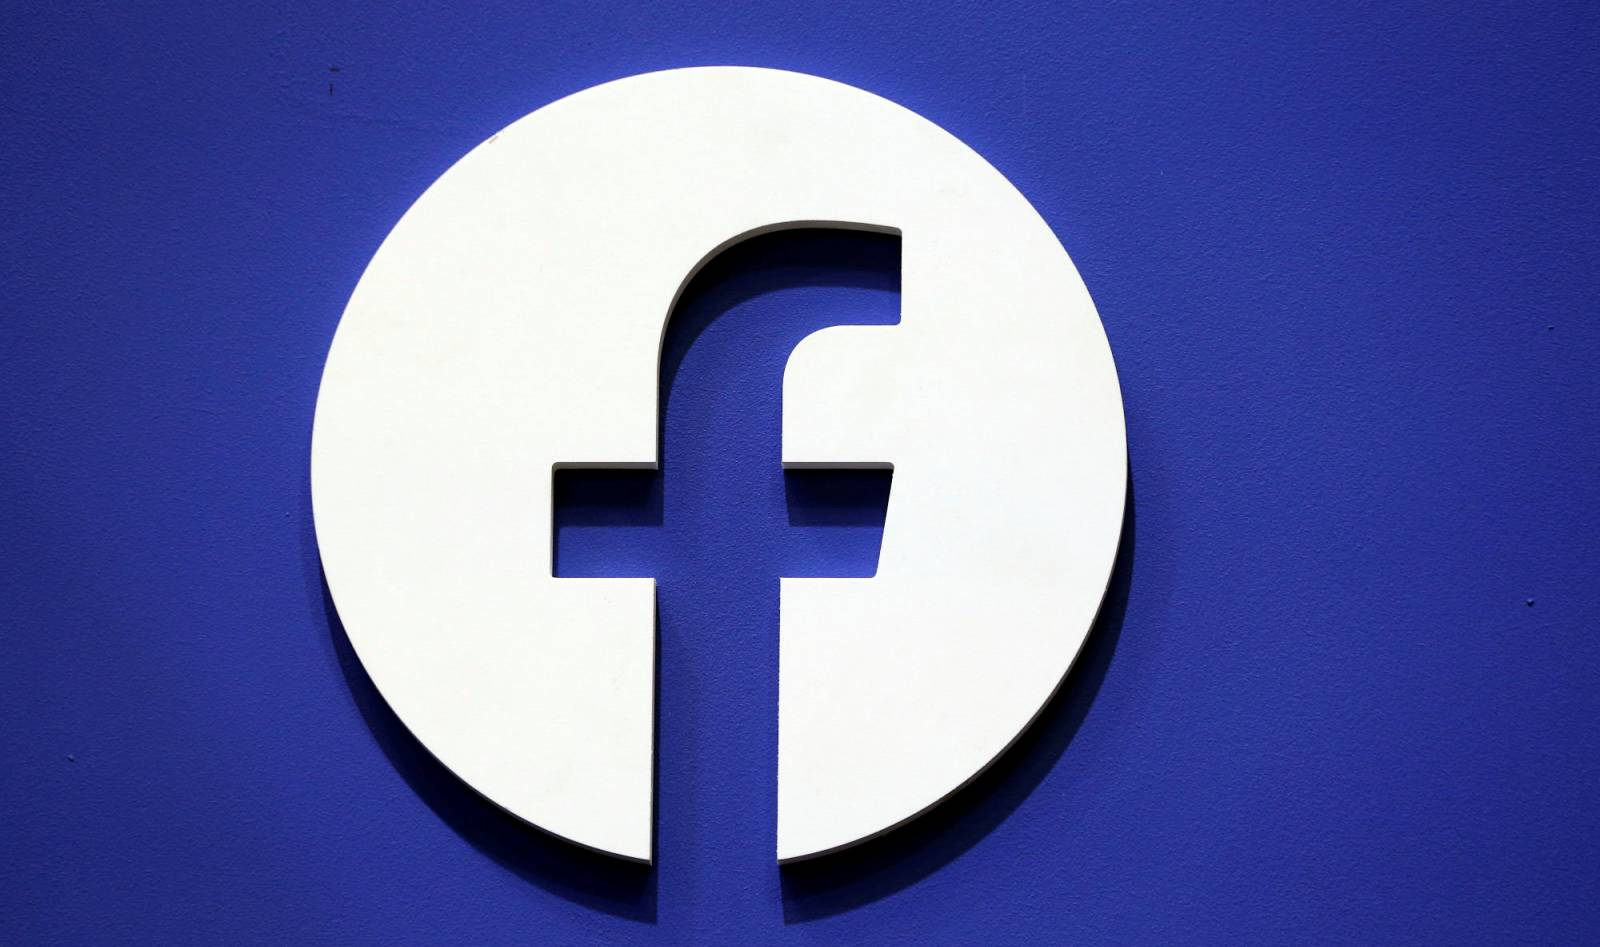 Facebook news feed 2019